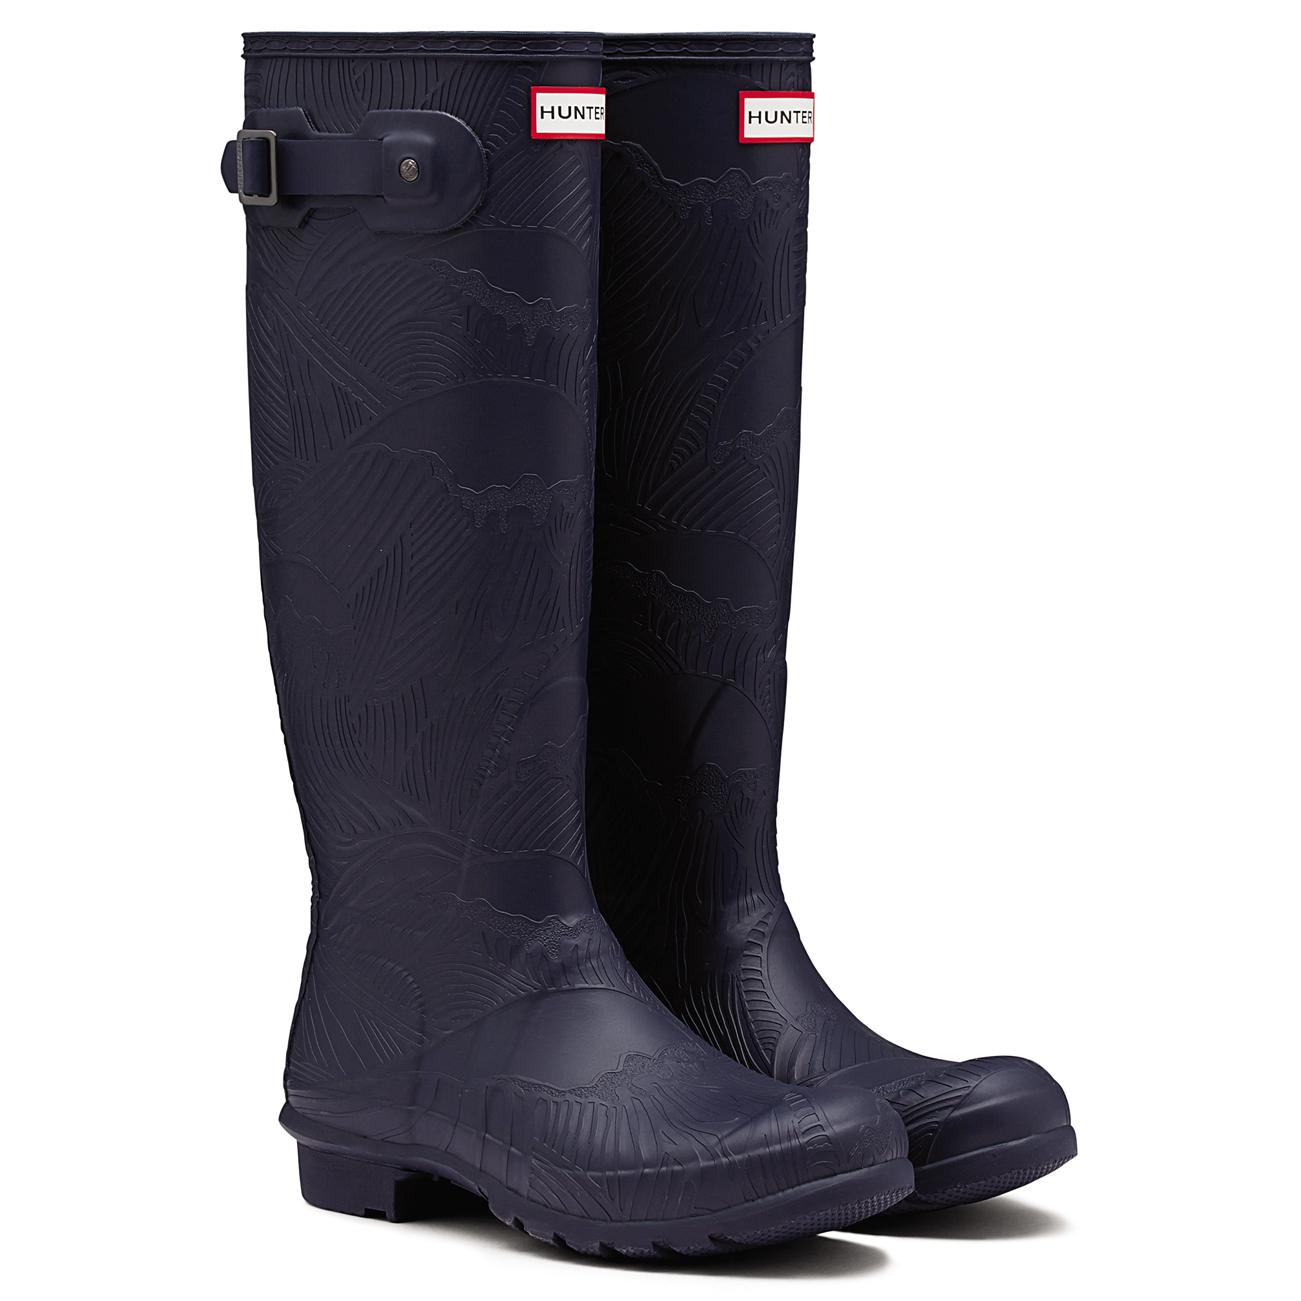 Mujer Hunter Hunter Hunter Original Tall Onda Con Textura Wellington Invierno botas De Nieve UK 3-9 5a4208